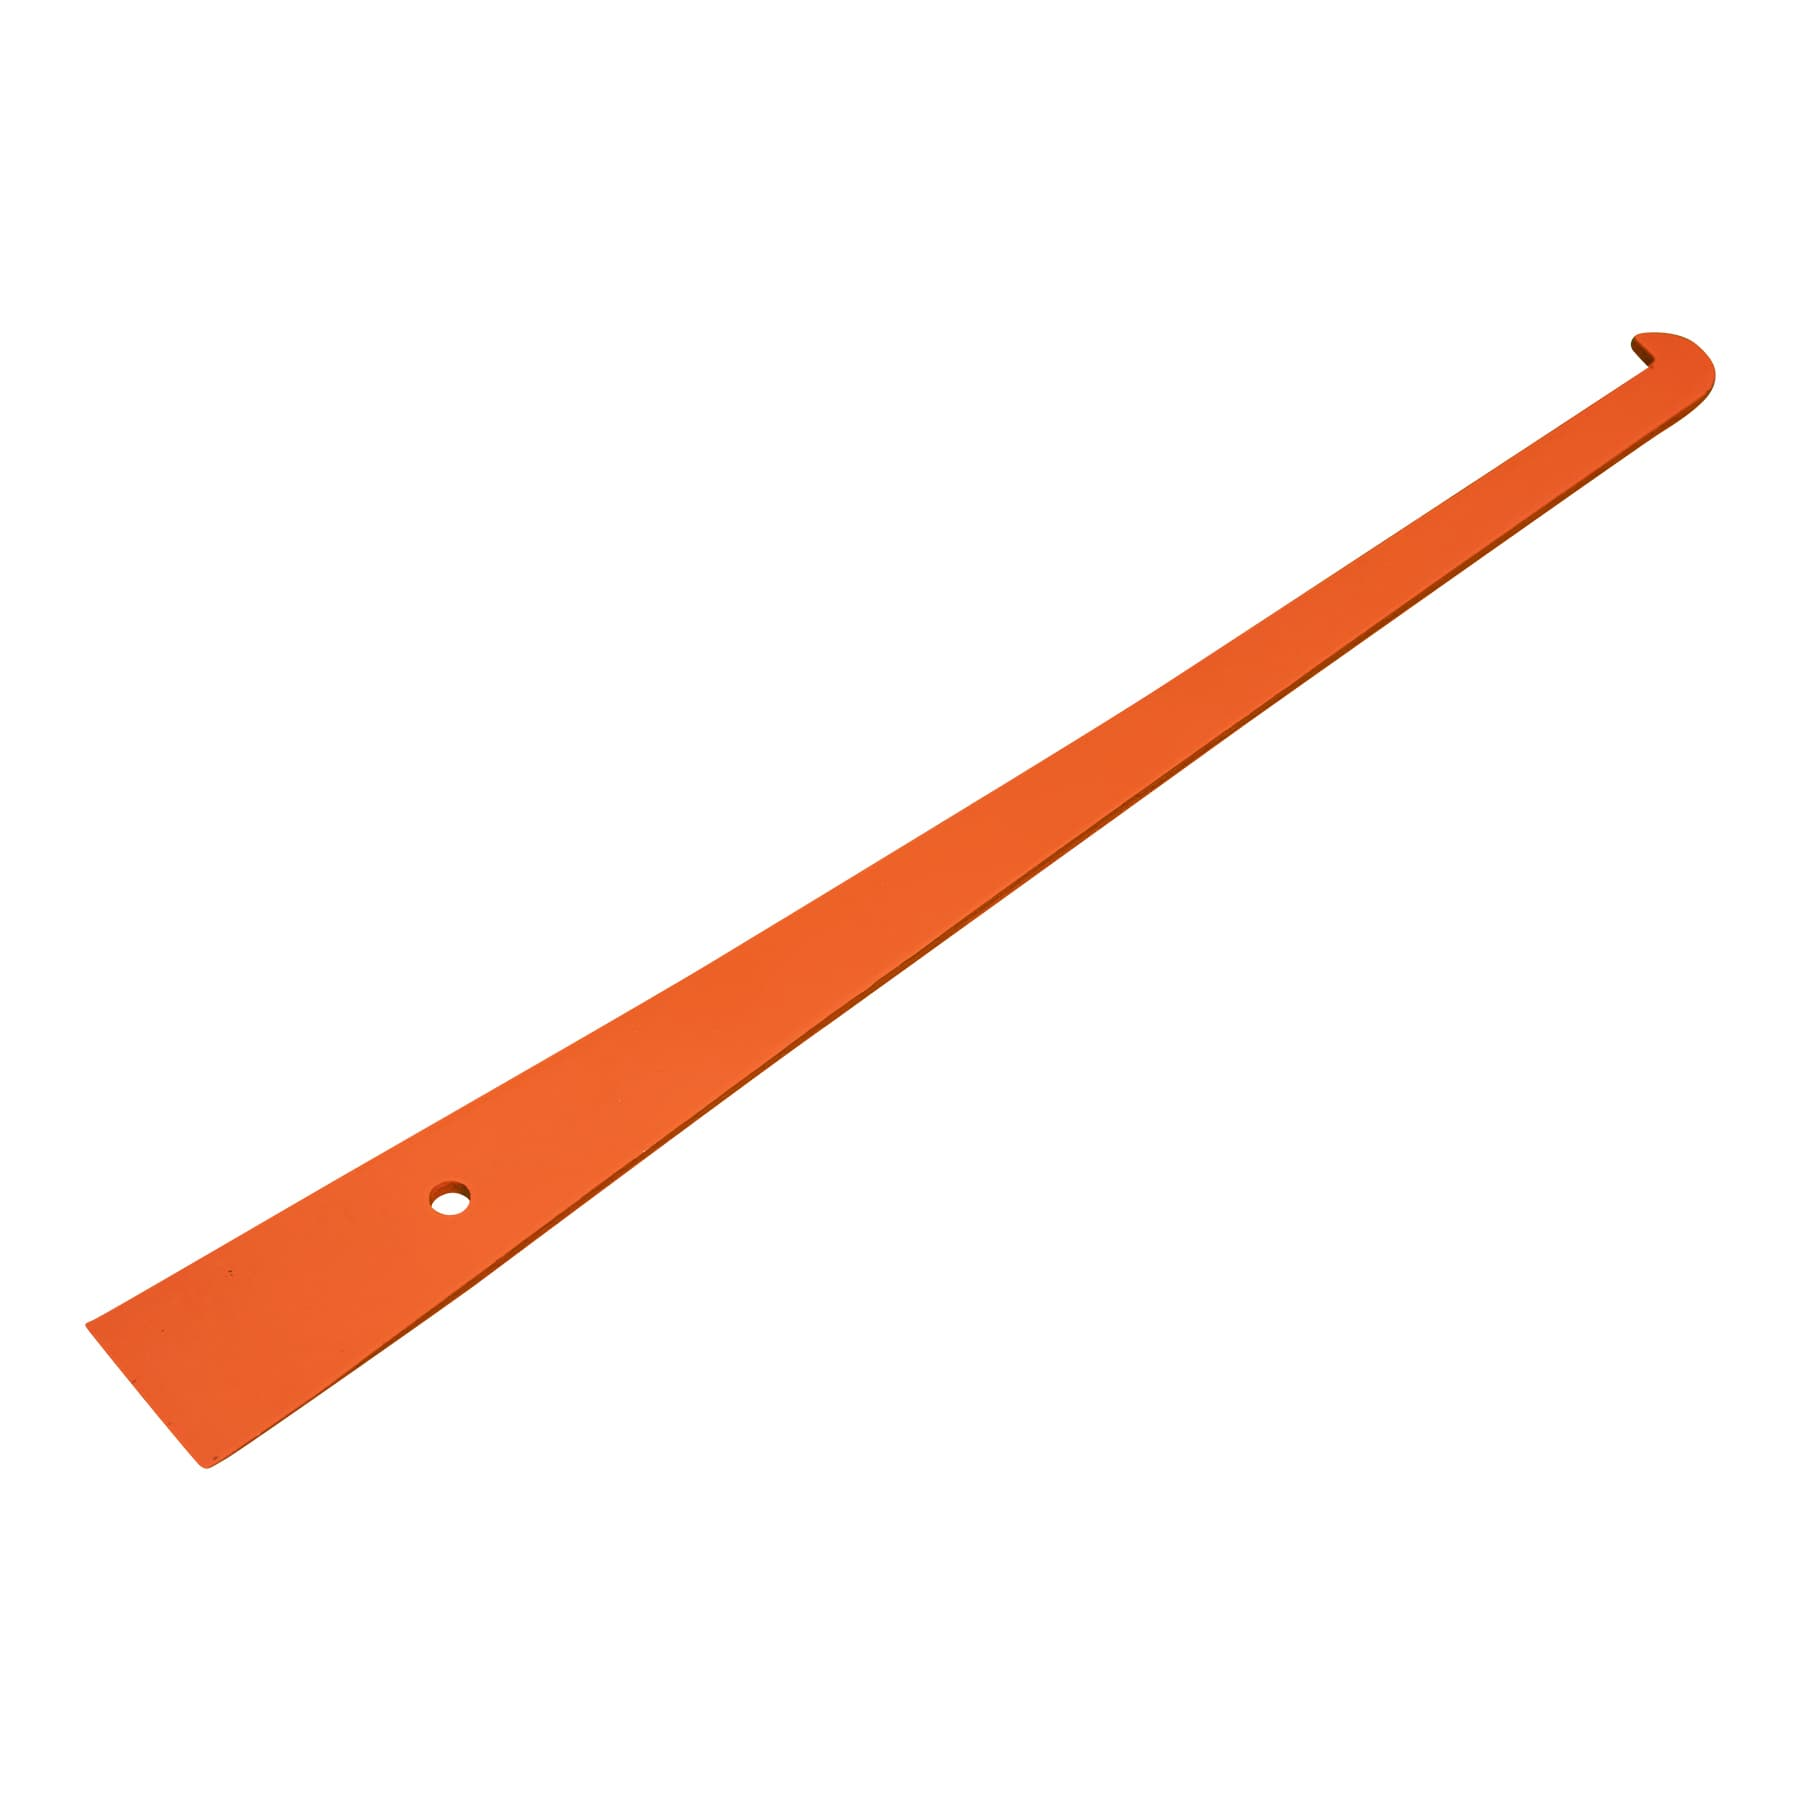 Stockmeissel schmal und extra lang, 31 cm lang, orange